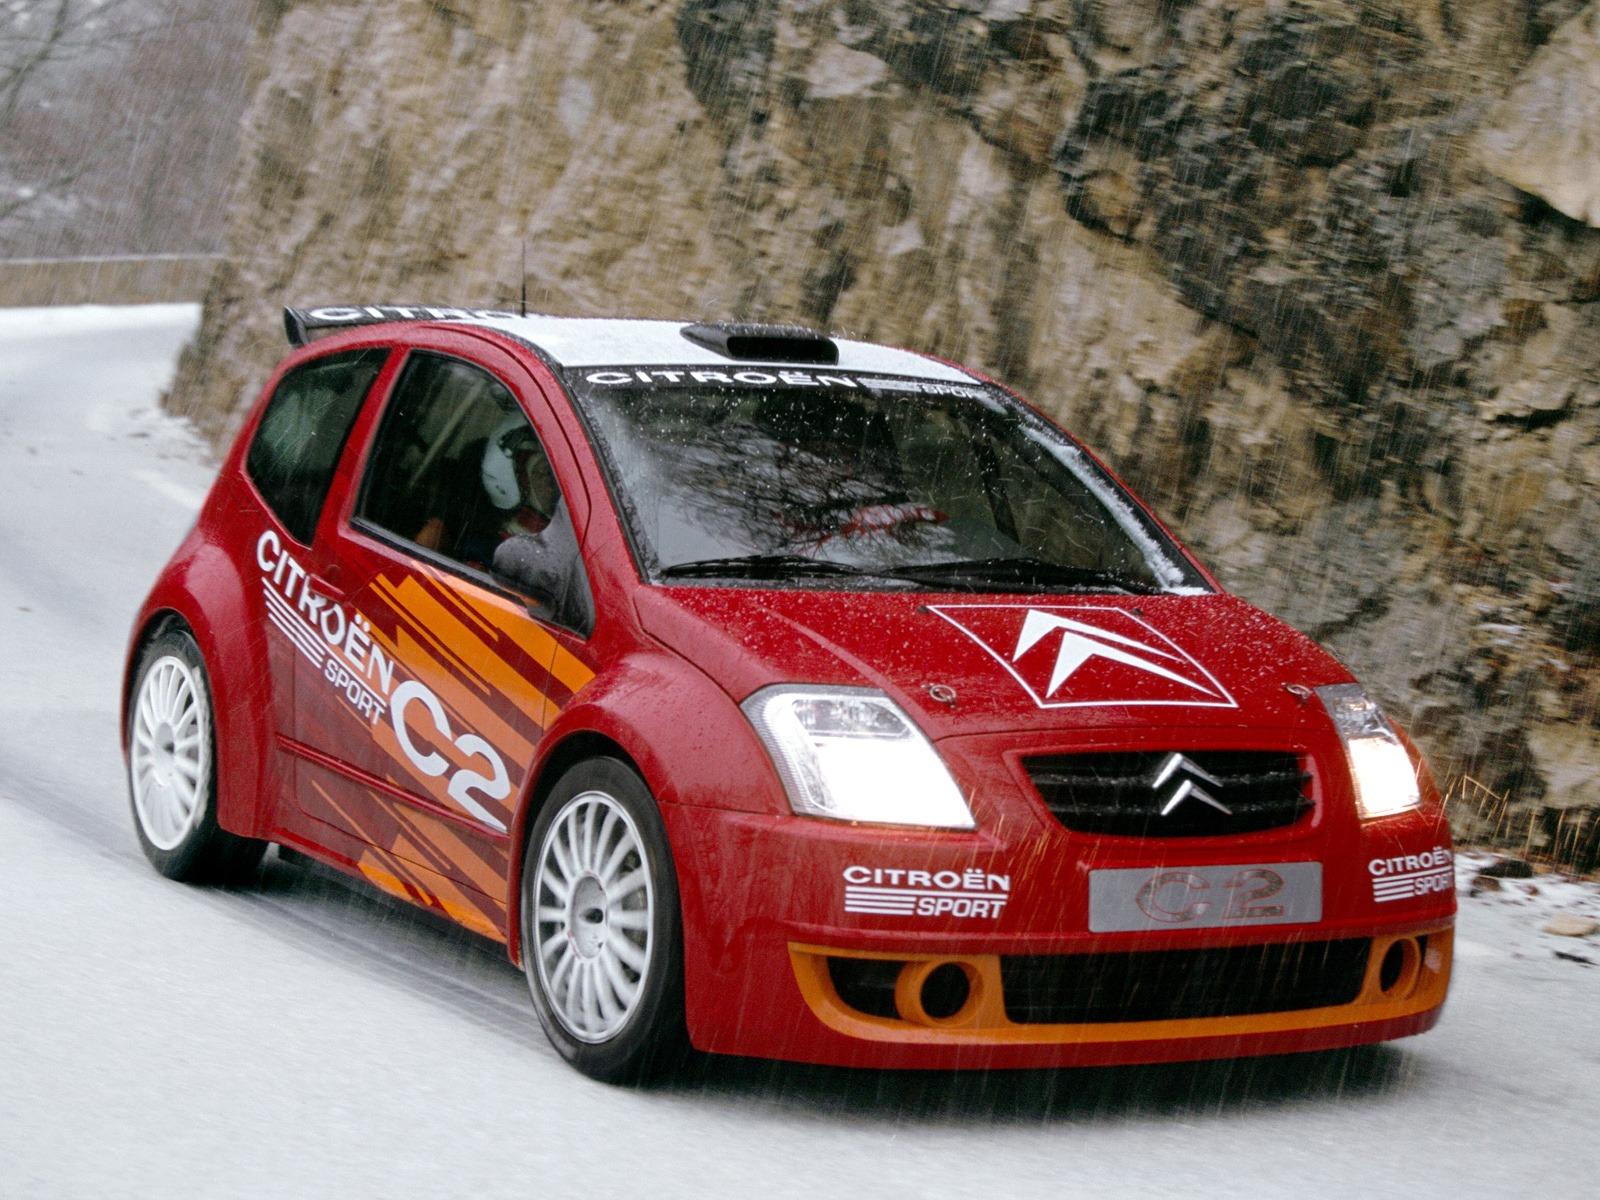 Top 10 Fastest Cars >> Citroën C2 Sport Concept (2003) - Old Concept Cars